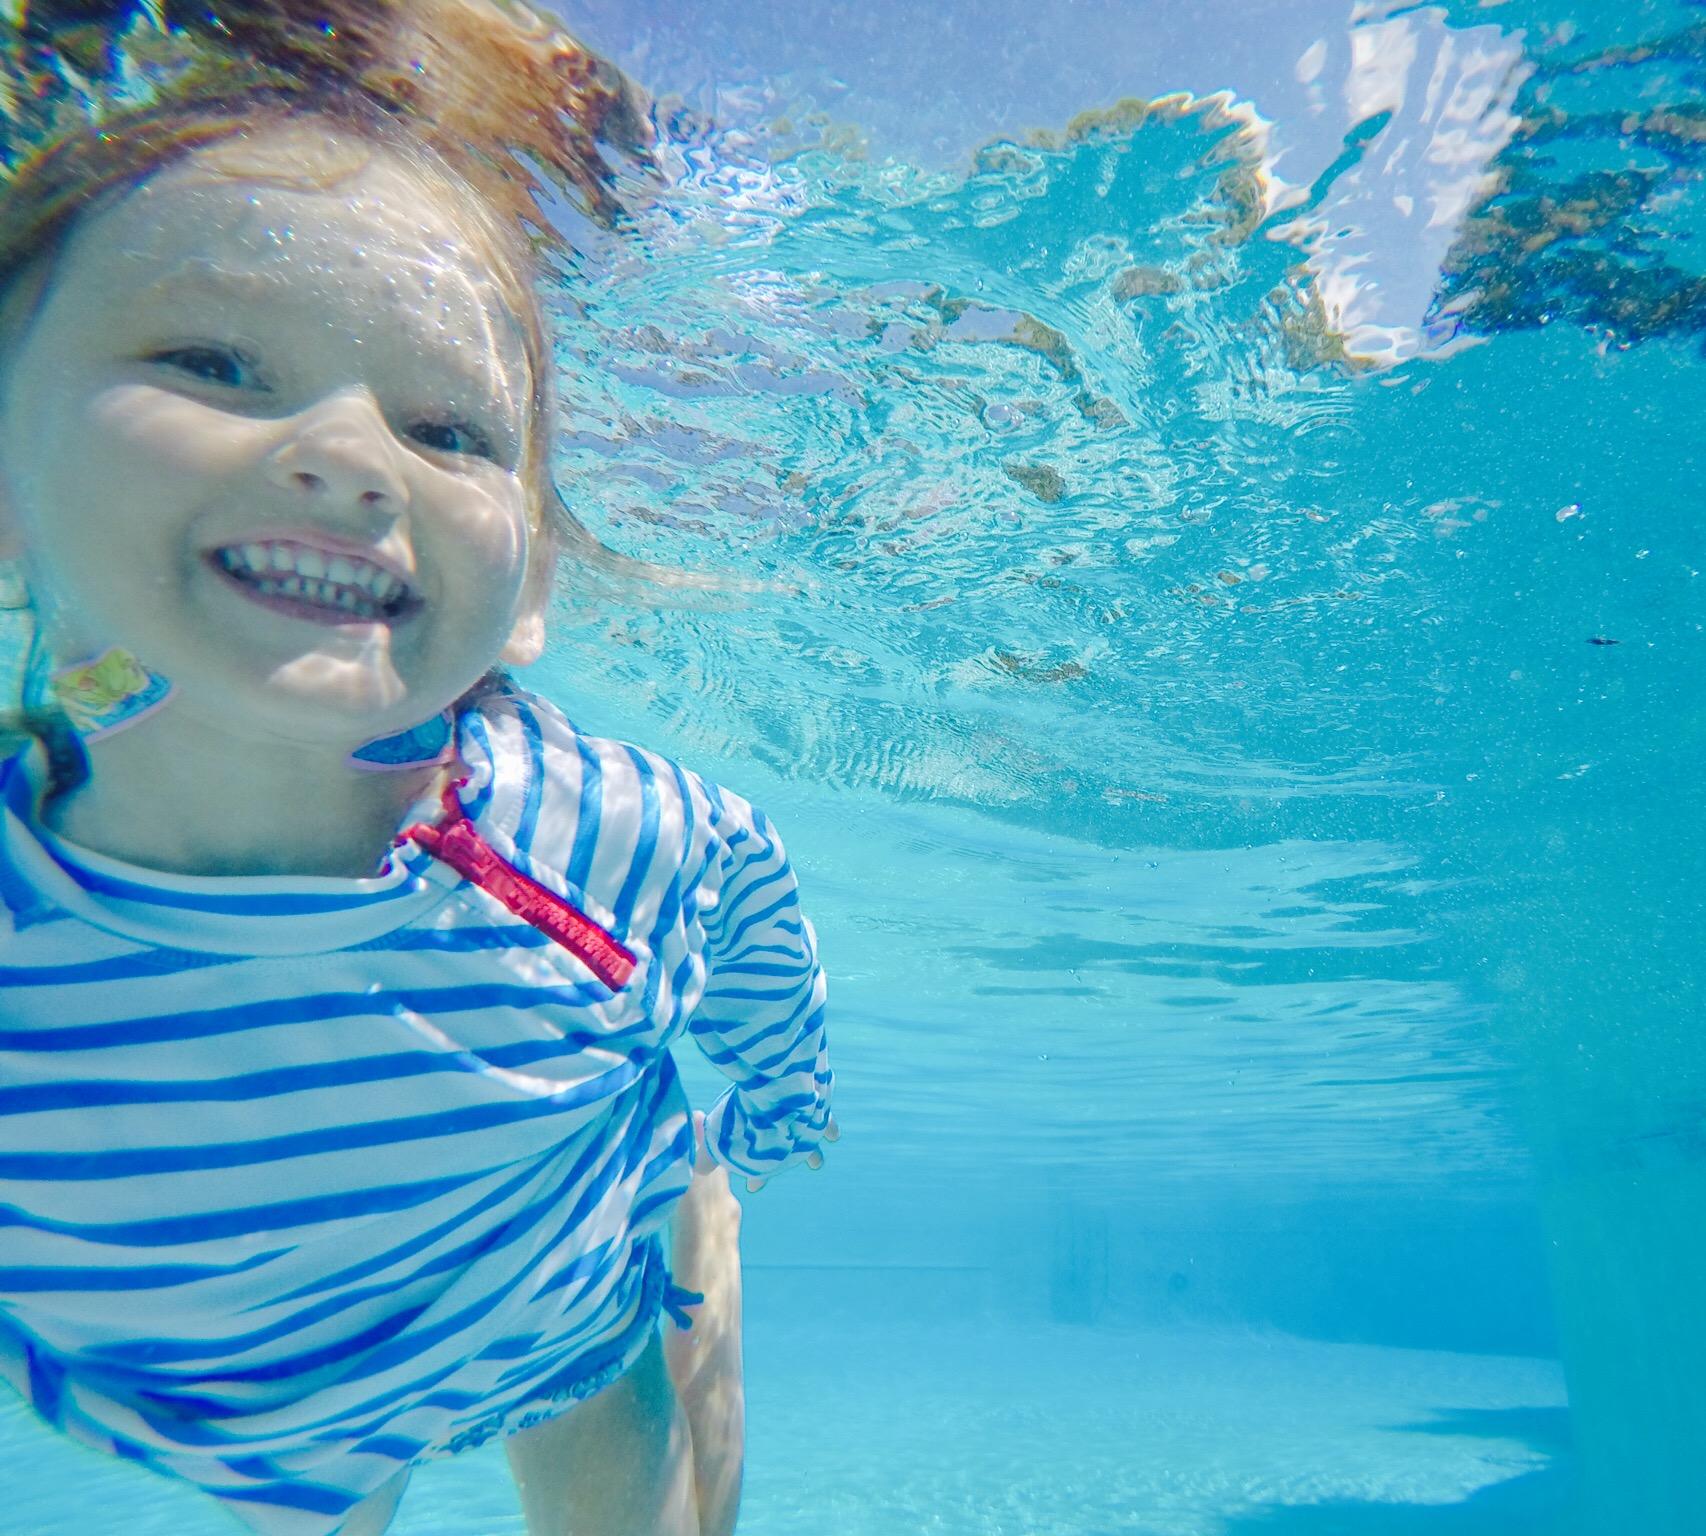 Cooper swimming